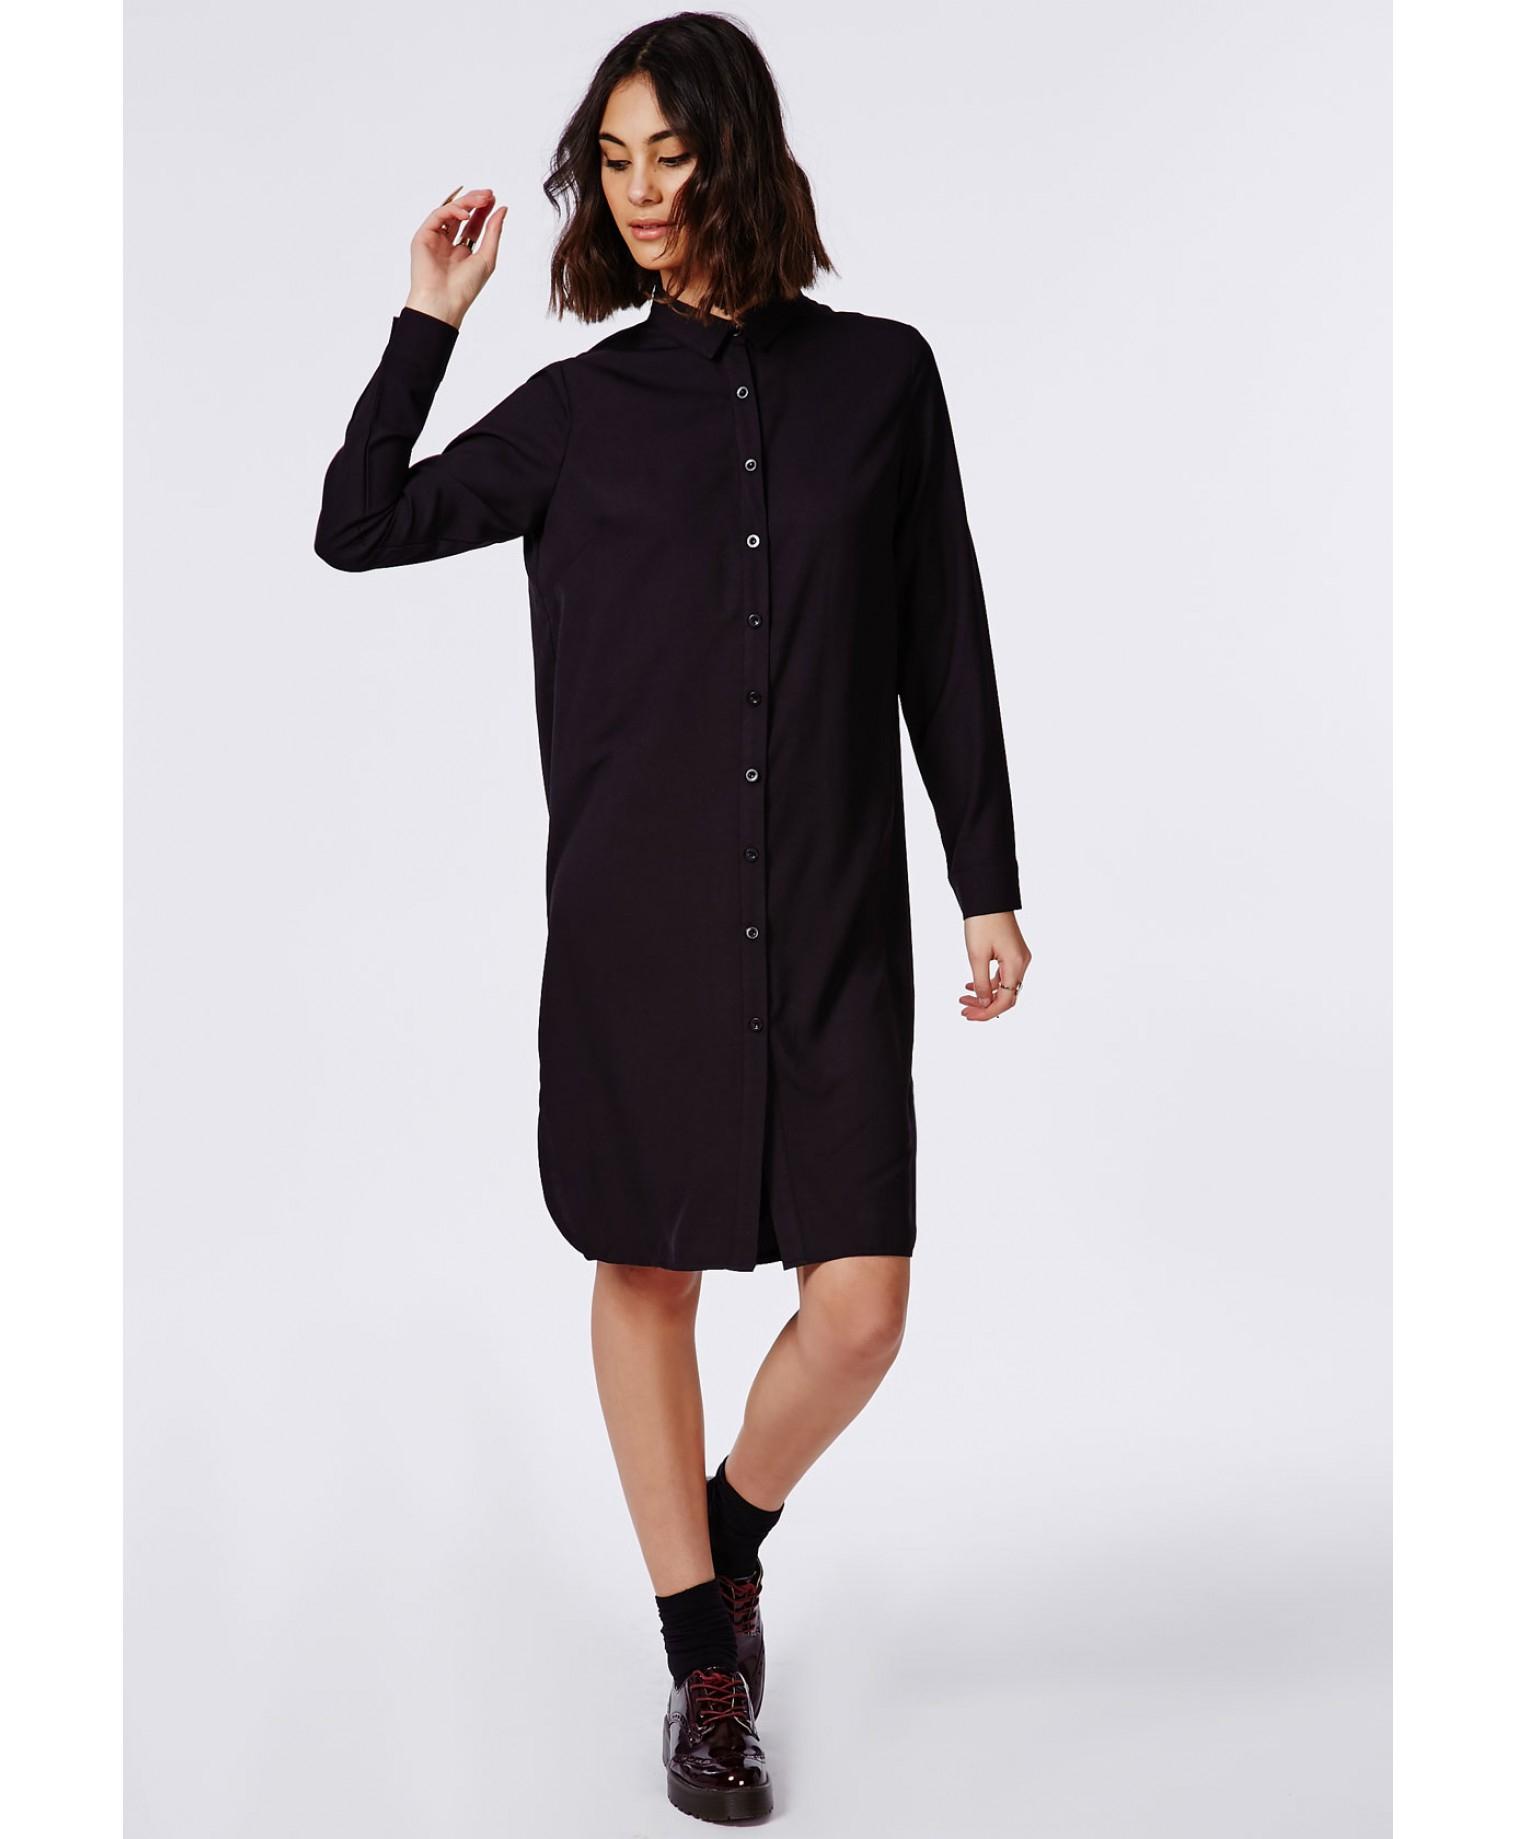 Missguided floaty midi shirt dress black in black lyst for Midi shirt dress black